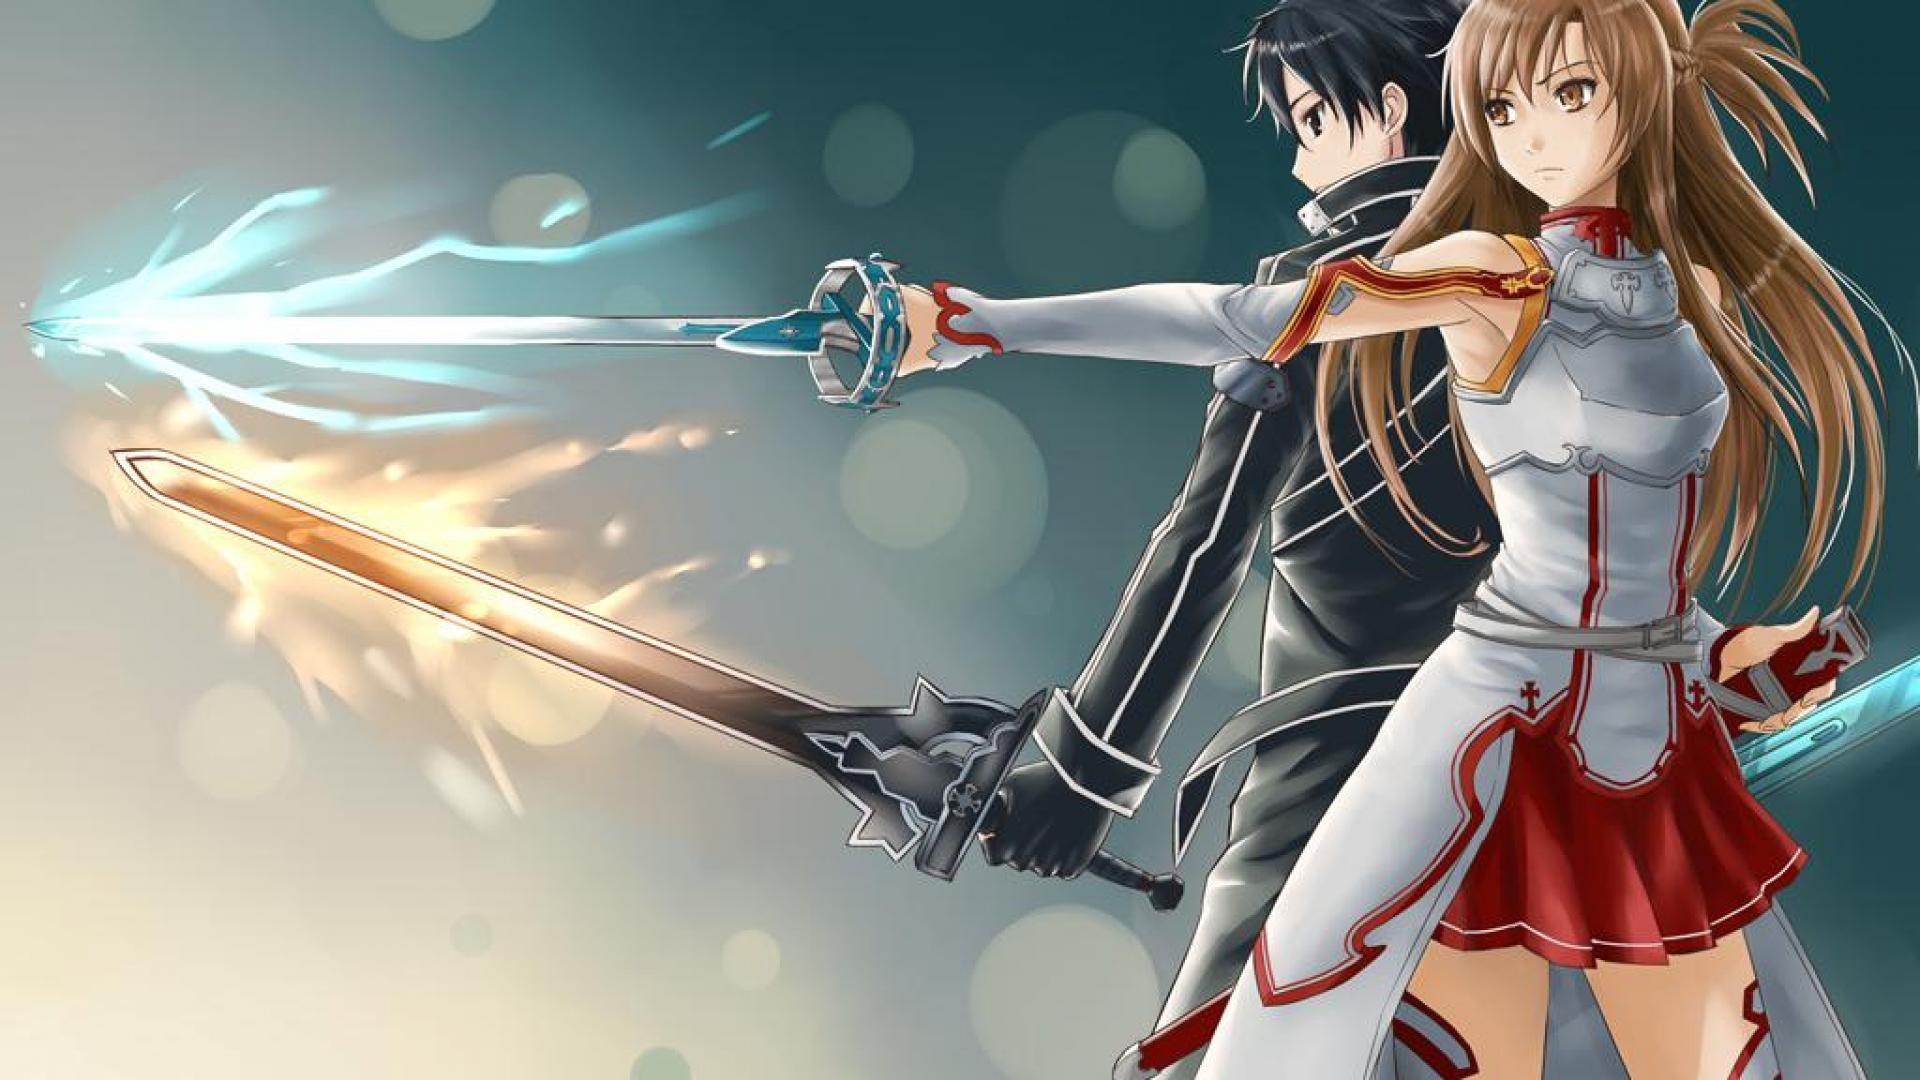 Asuna Wallpaper 1 Download Free Beautiful High Resolution